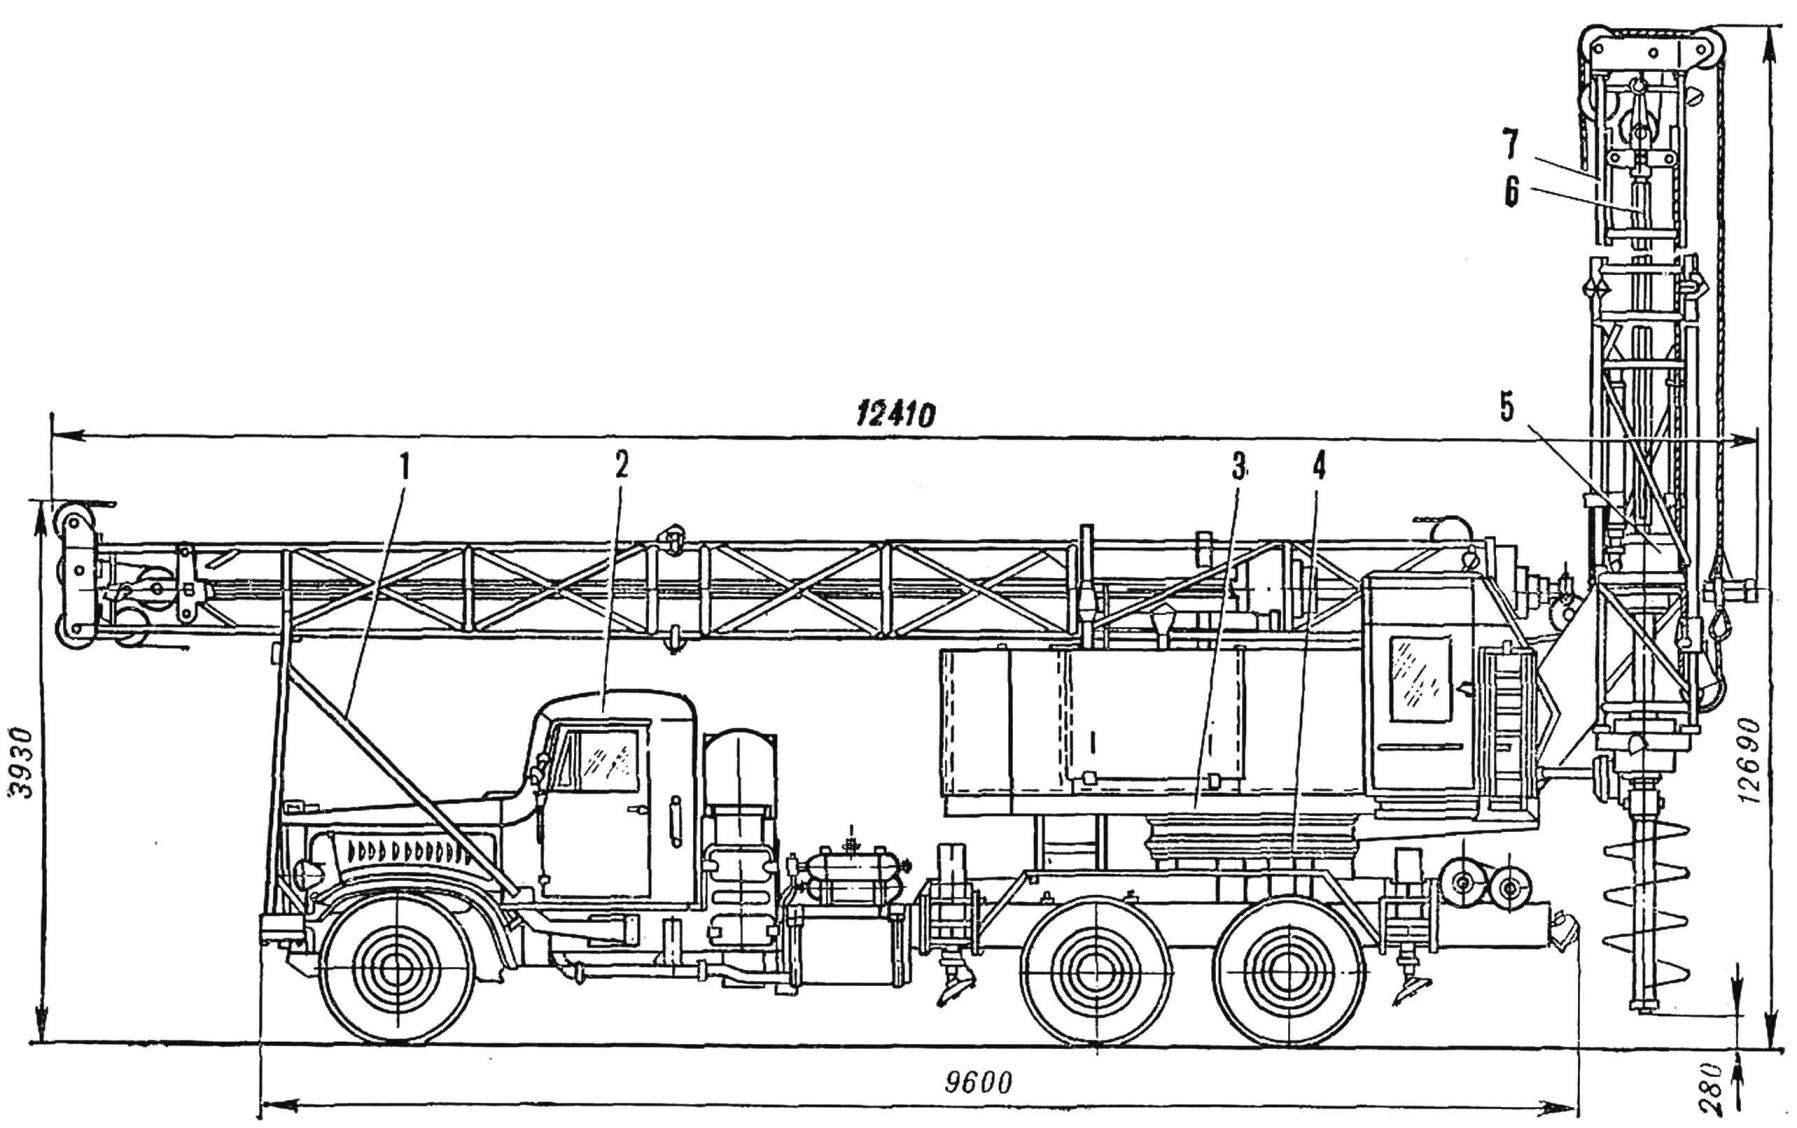 Fig. 8. Crane-boring machine BM-802С (working and transport position)